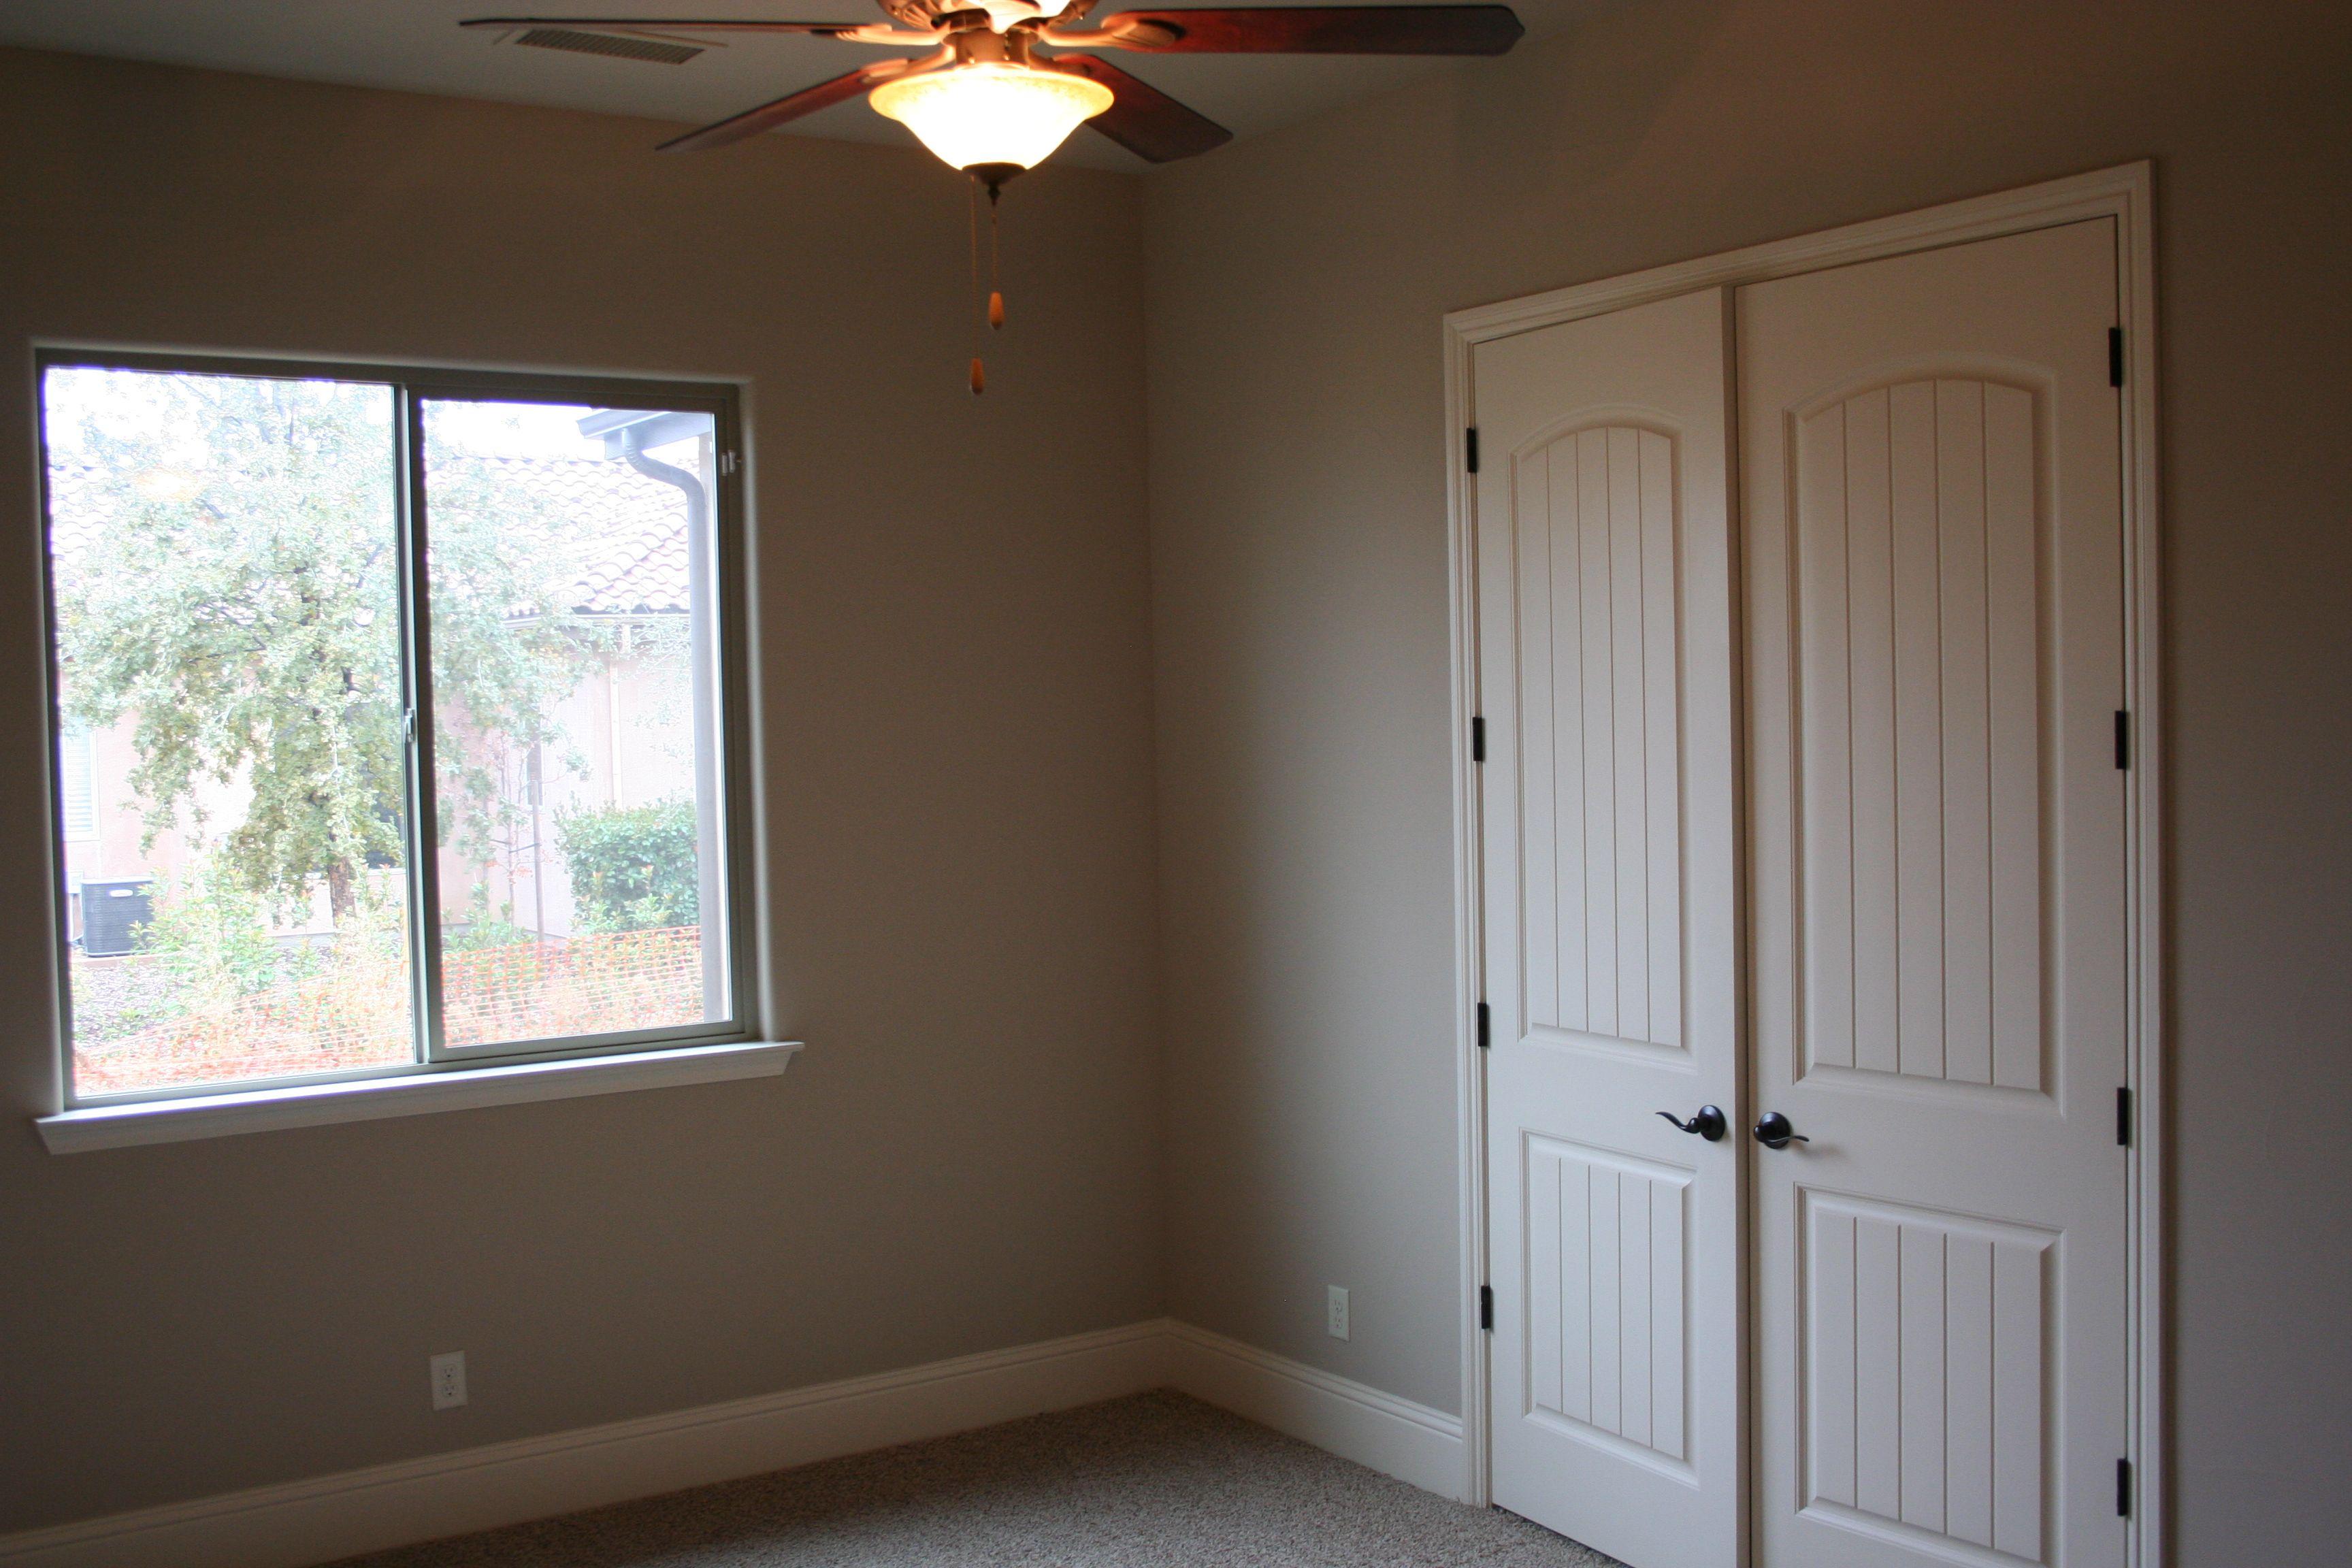 Hollow Core Cheyenne Groove Interior Doors 8 39 Doors Pinterest Interior Door Doors And